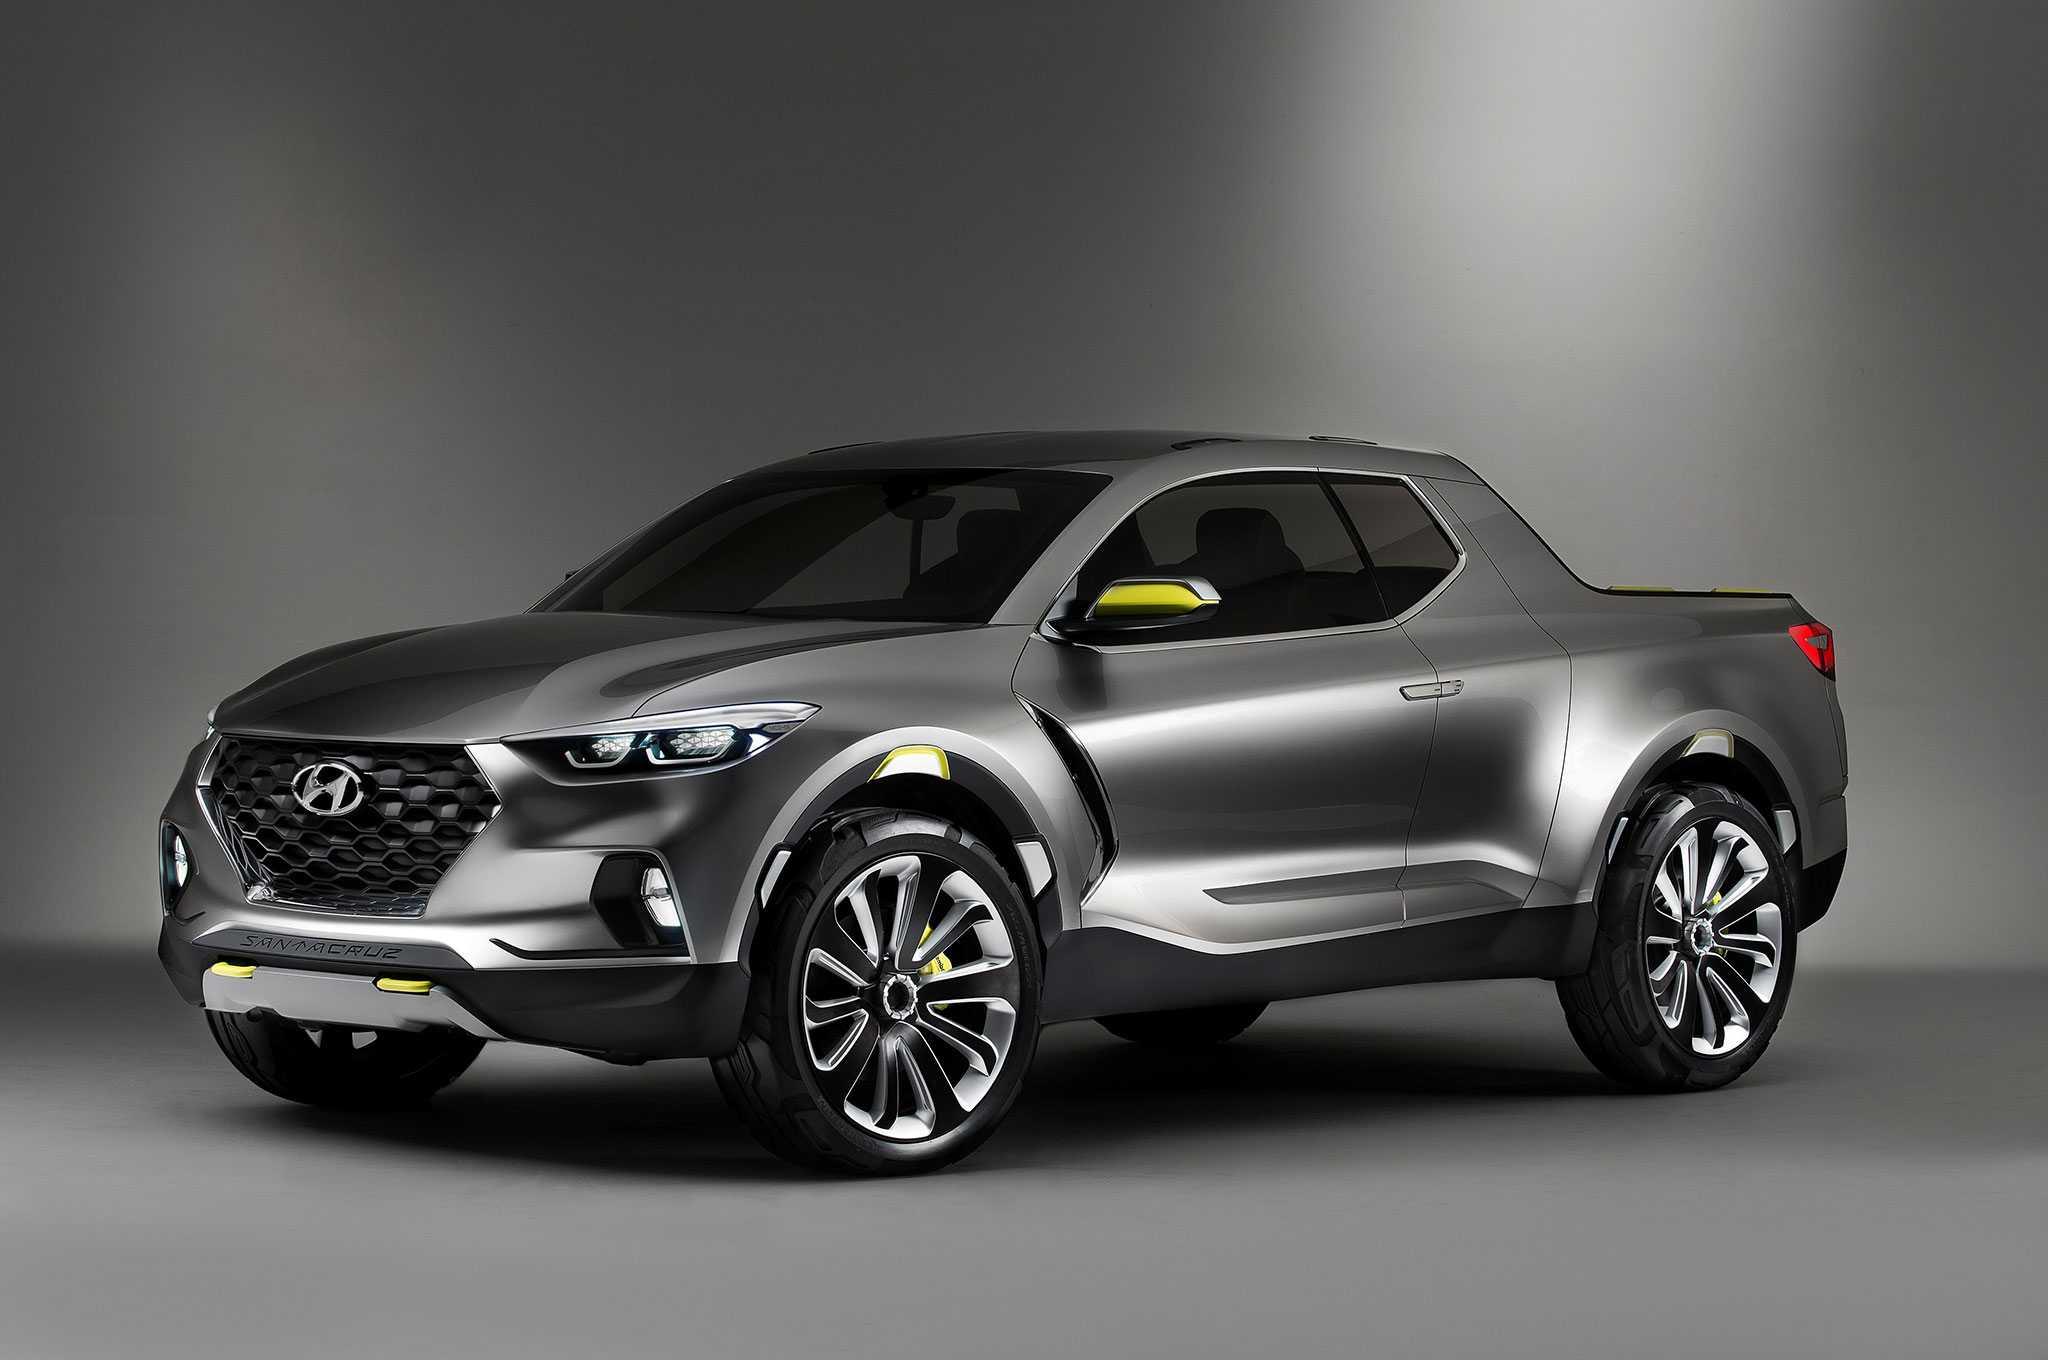 2019 Hyundai Santa Cruz Pickup Truck Nearing Production